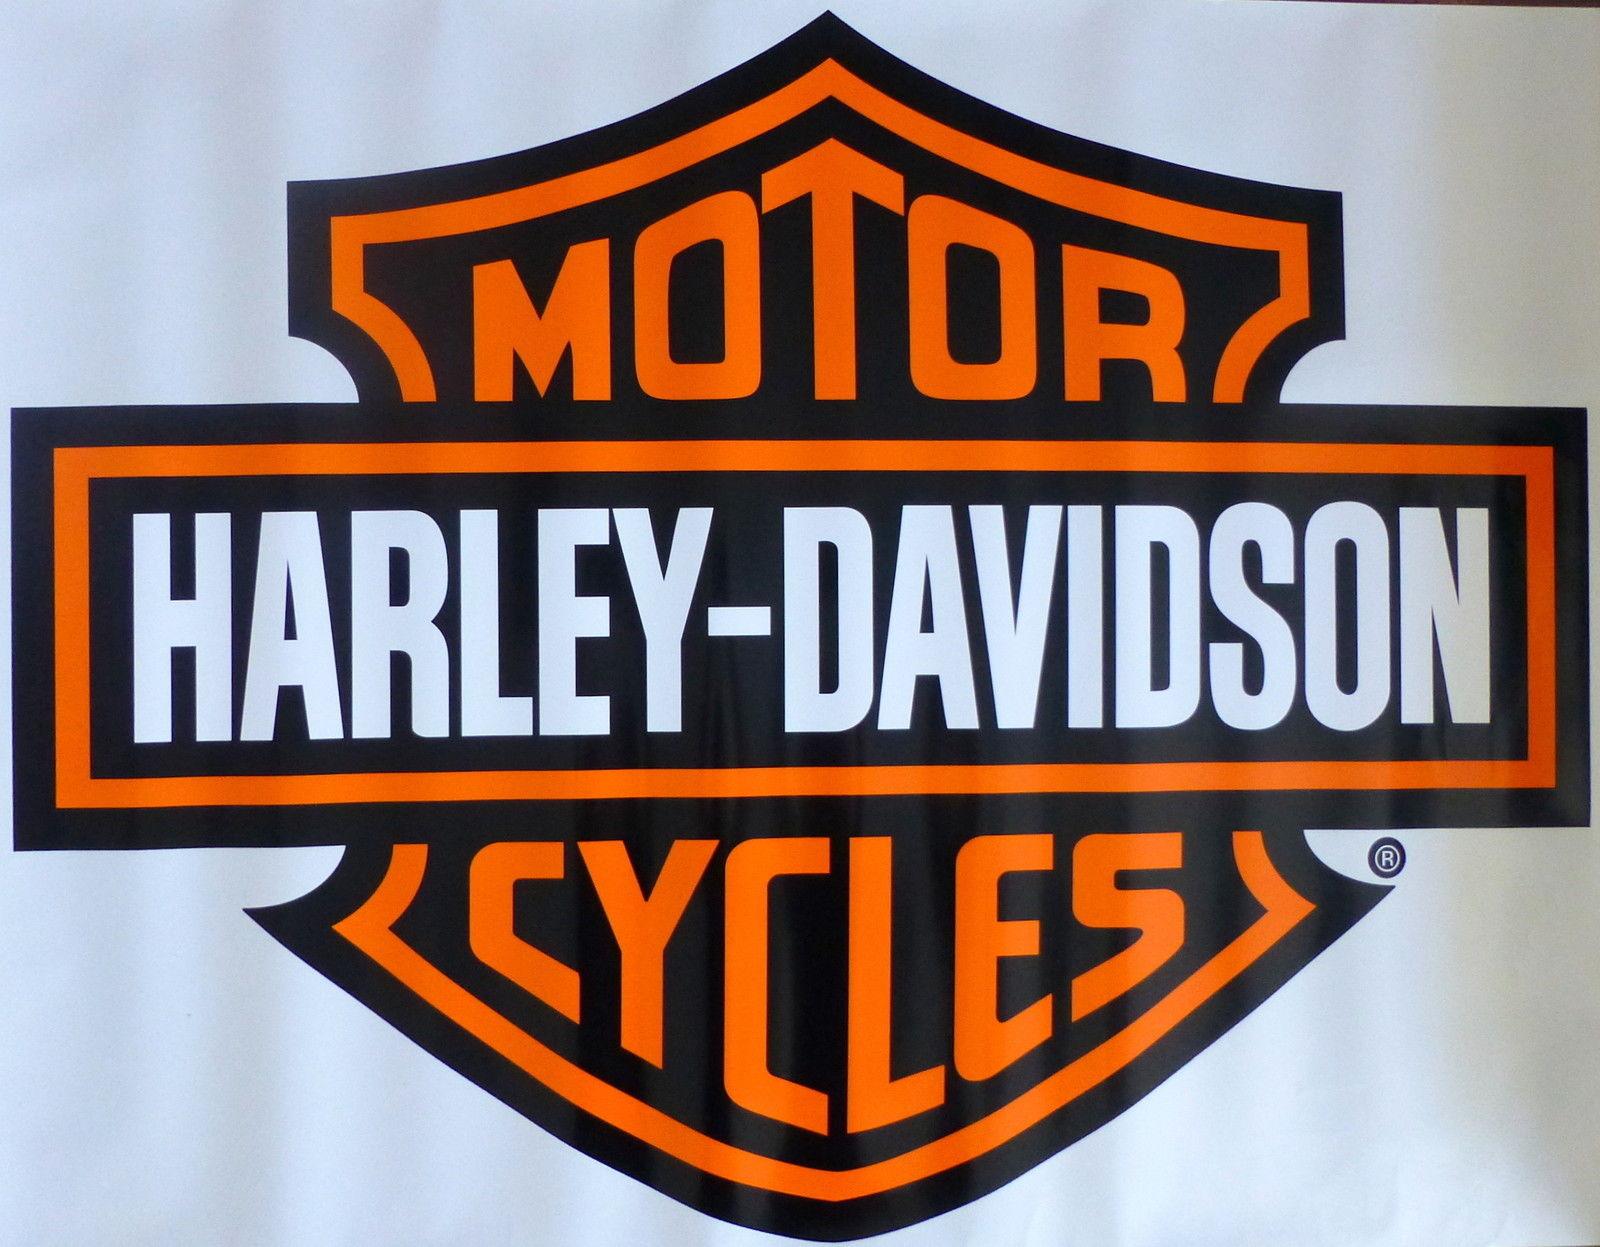 Harley Davidson Bar Shield Extra Large Trailer Decal Sticker | eBay